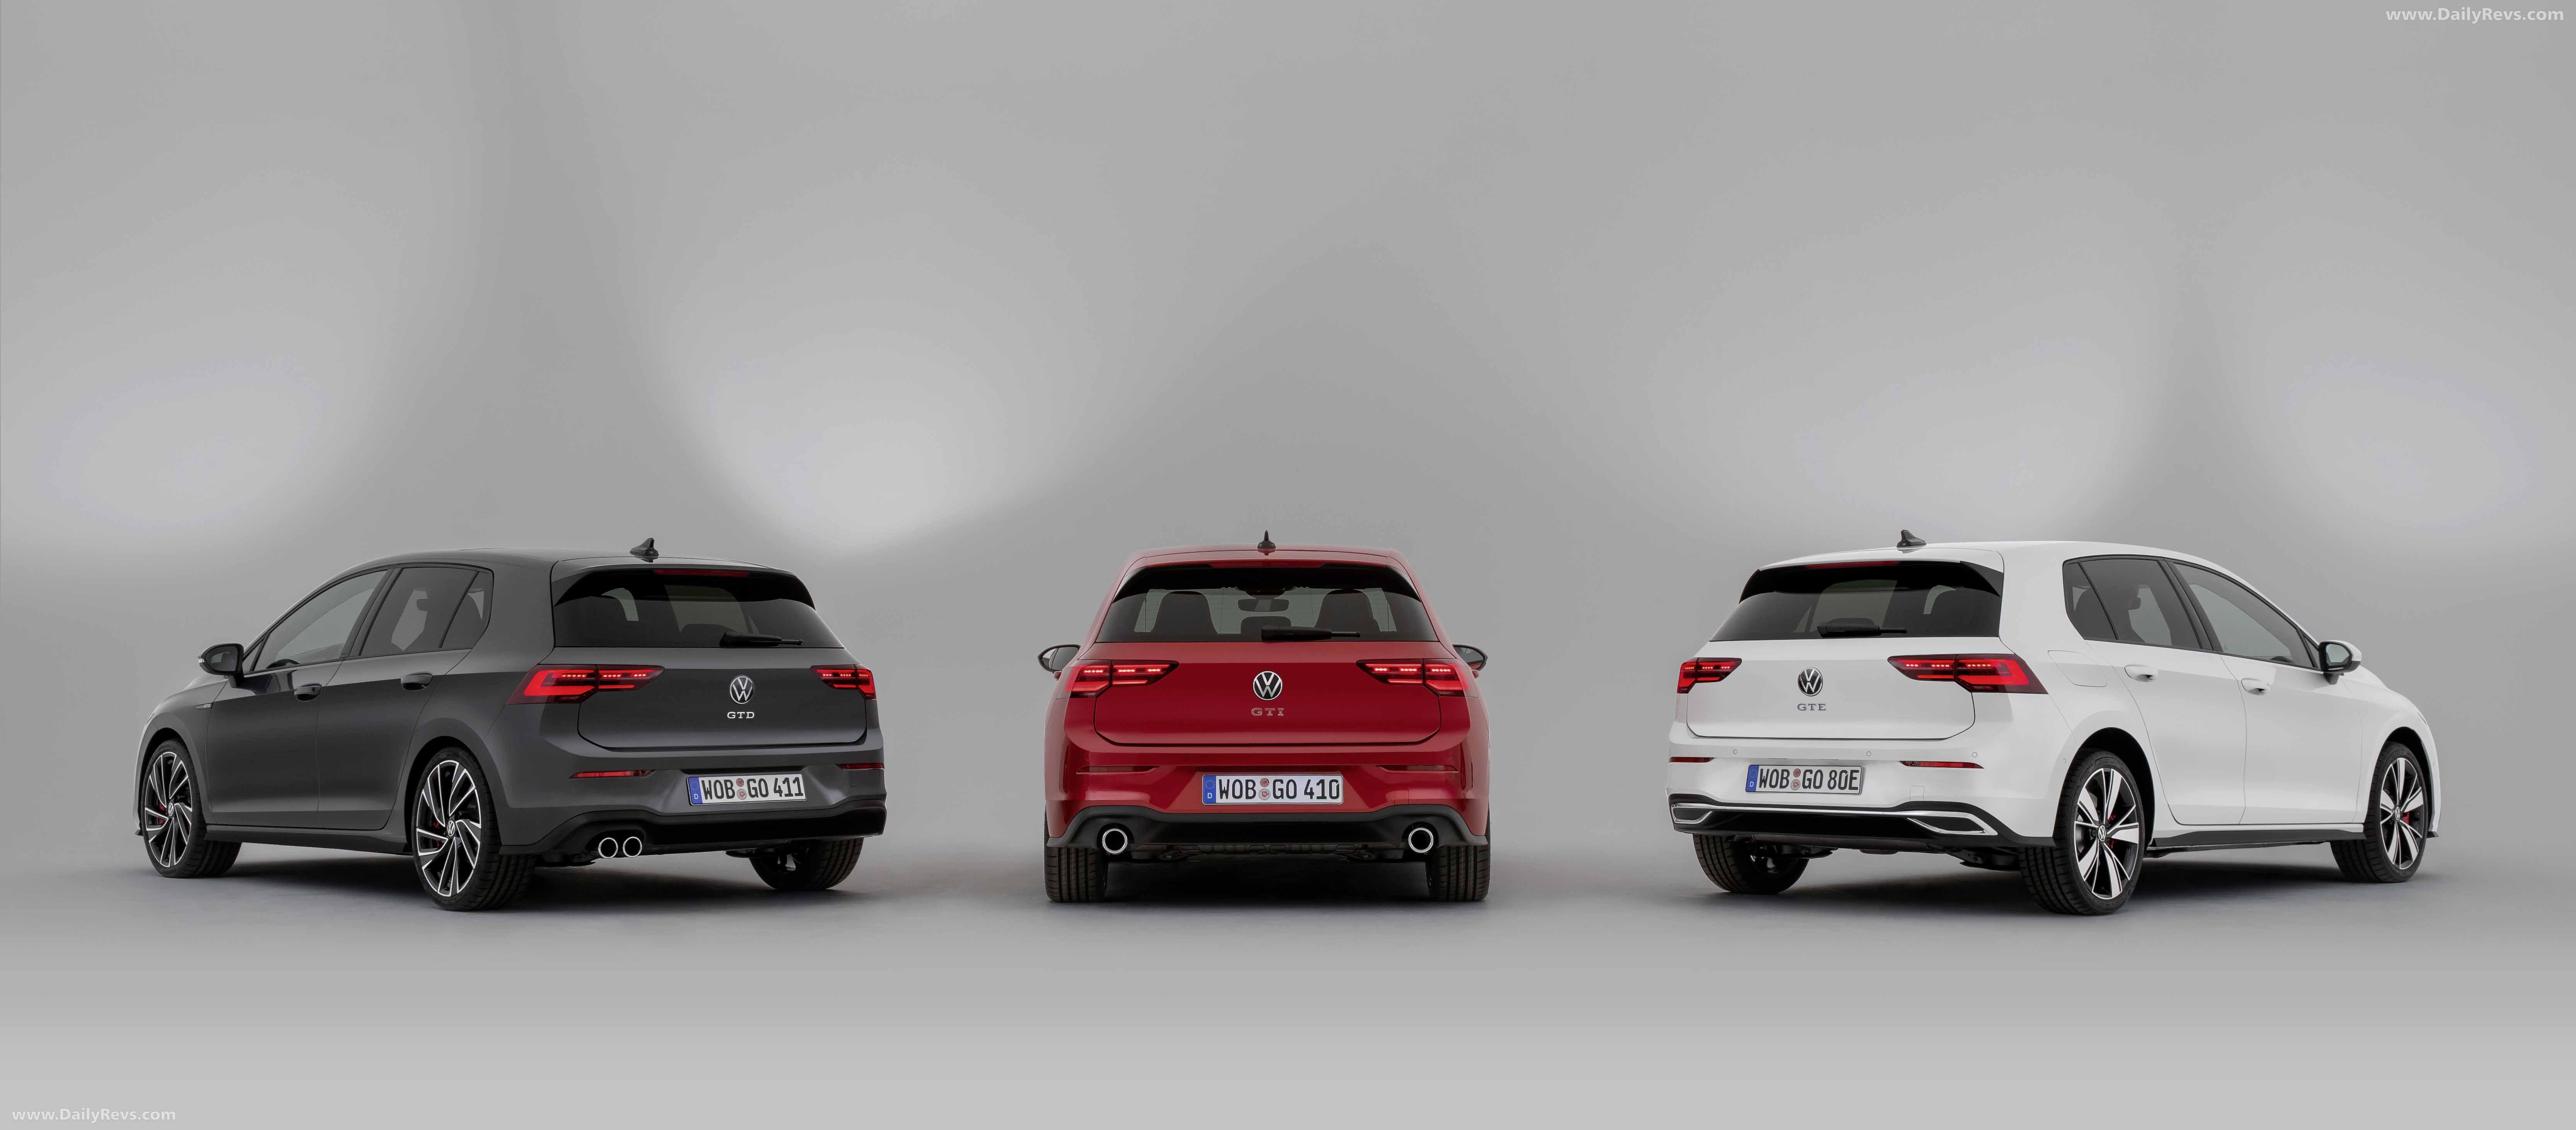 2021 Volkswagen Golf GTD Release Date and Concept